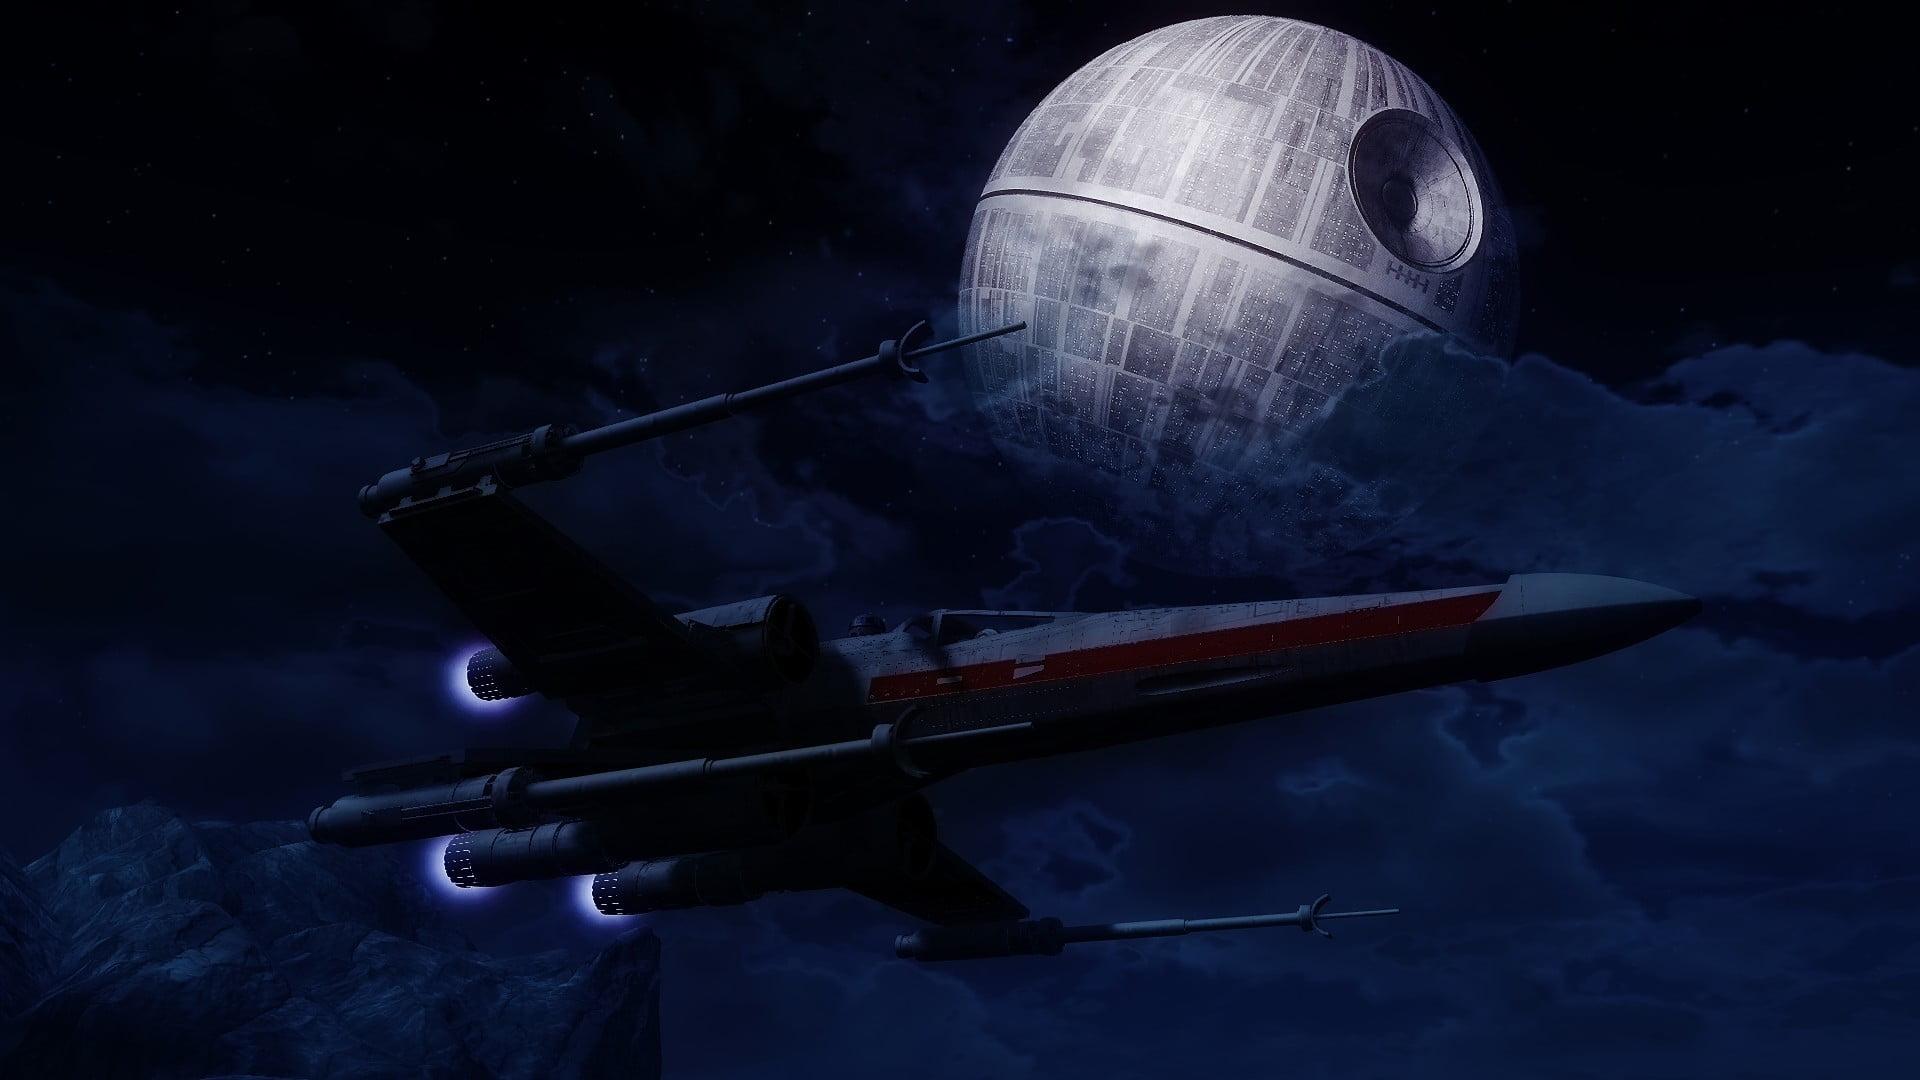 Star Wars Death Star Wallpaper Star Wars Artwork Star Wars Death Star 324390 Hd Wallpaper Backgrounds Download